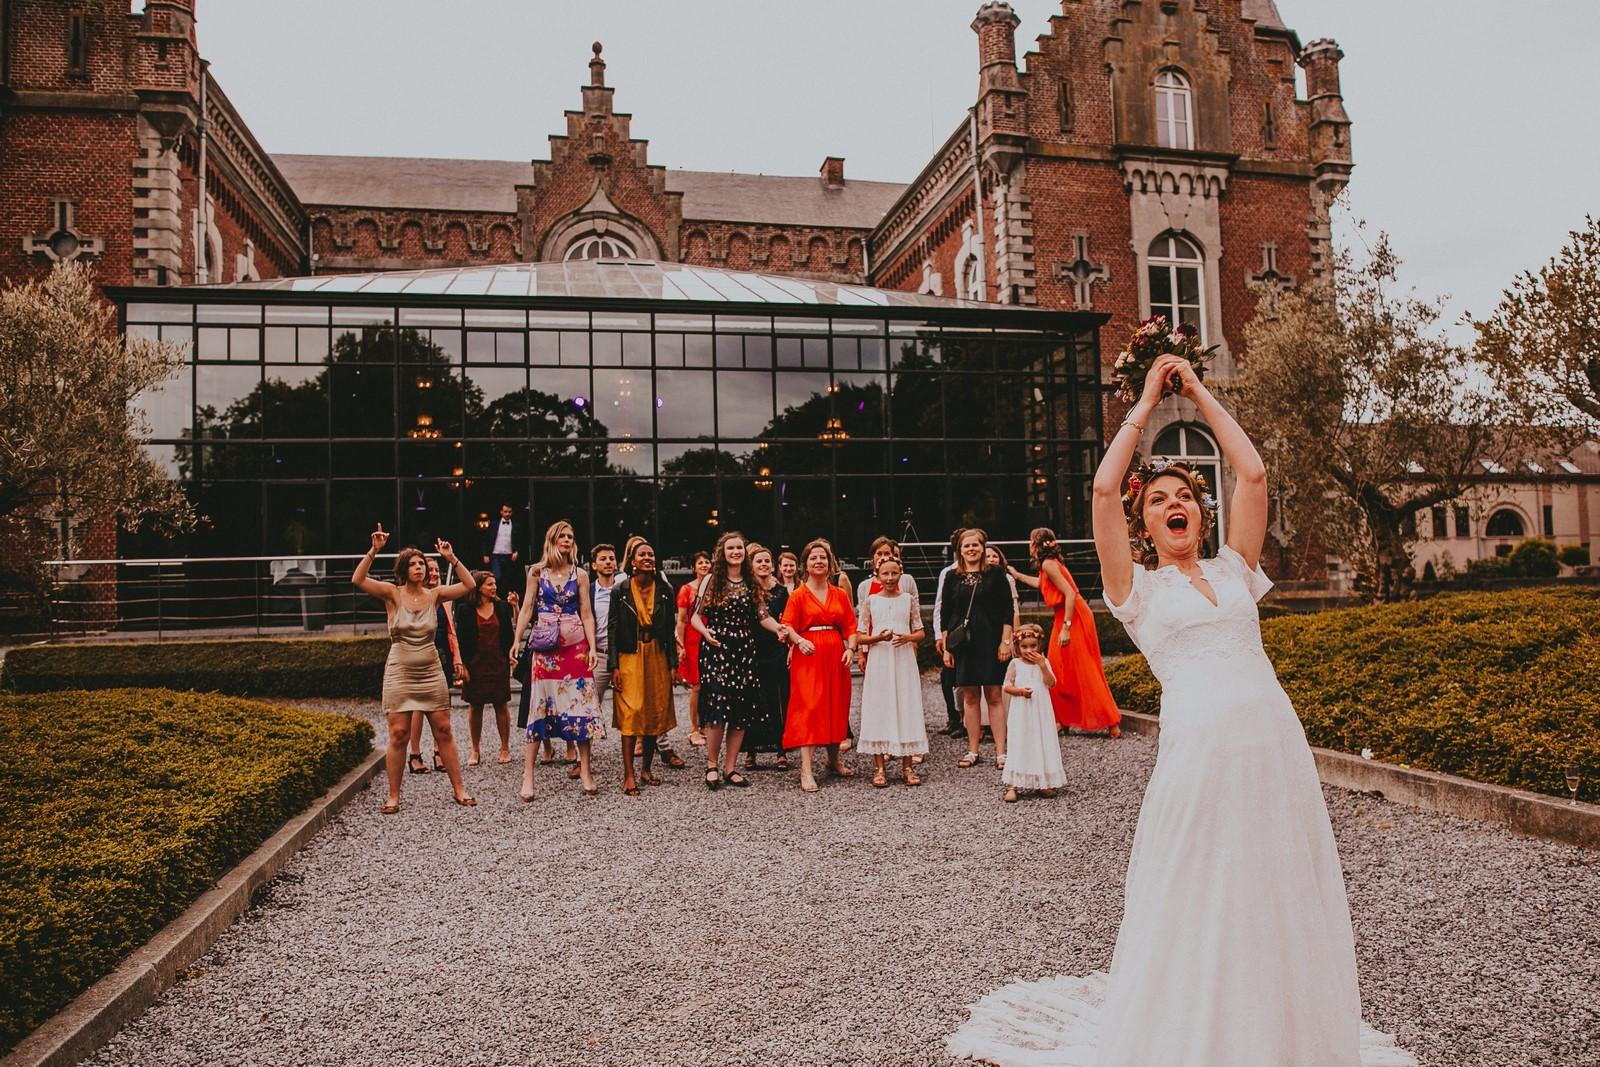 photographe mariage chateau de bourgogne 50